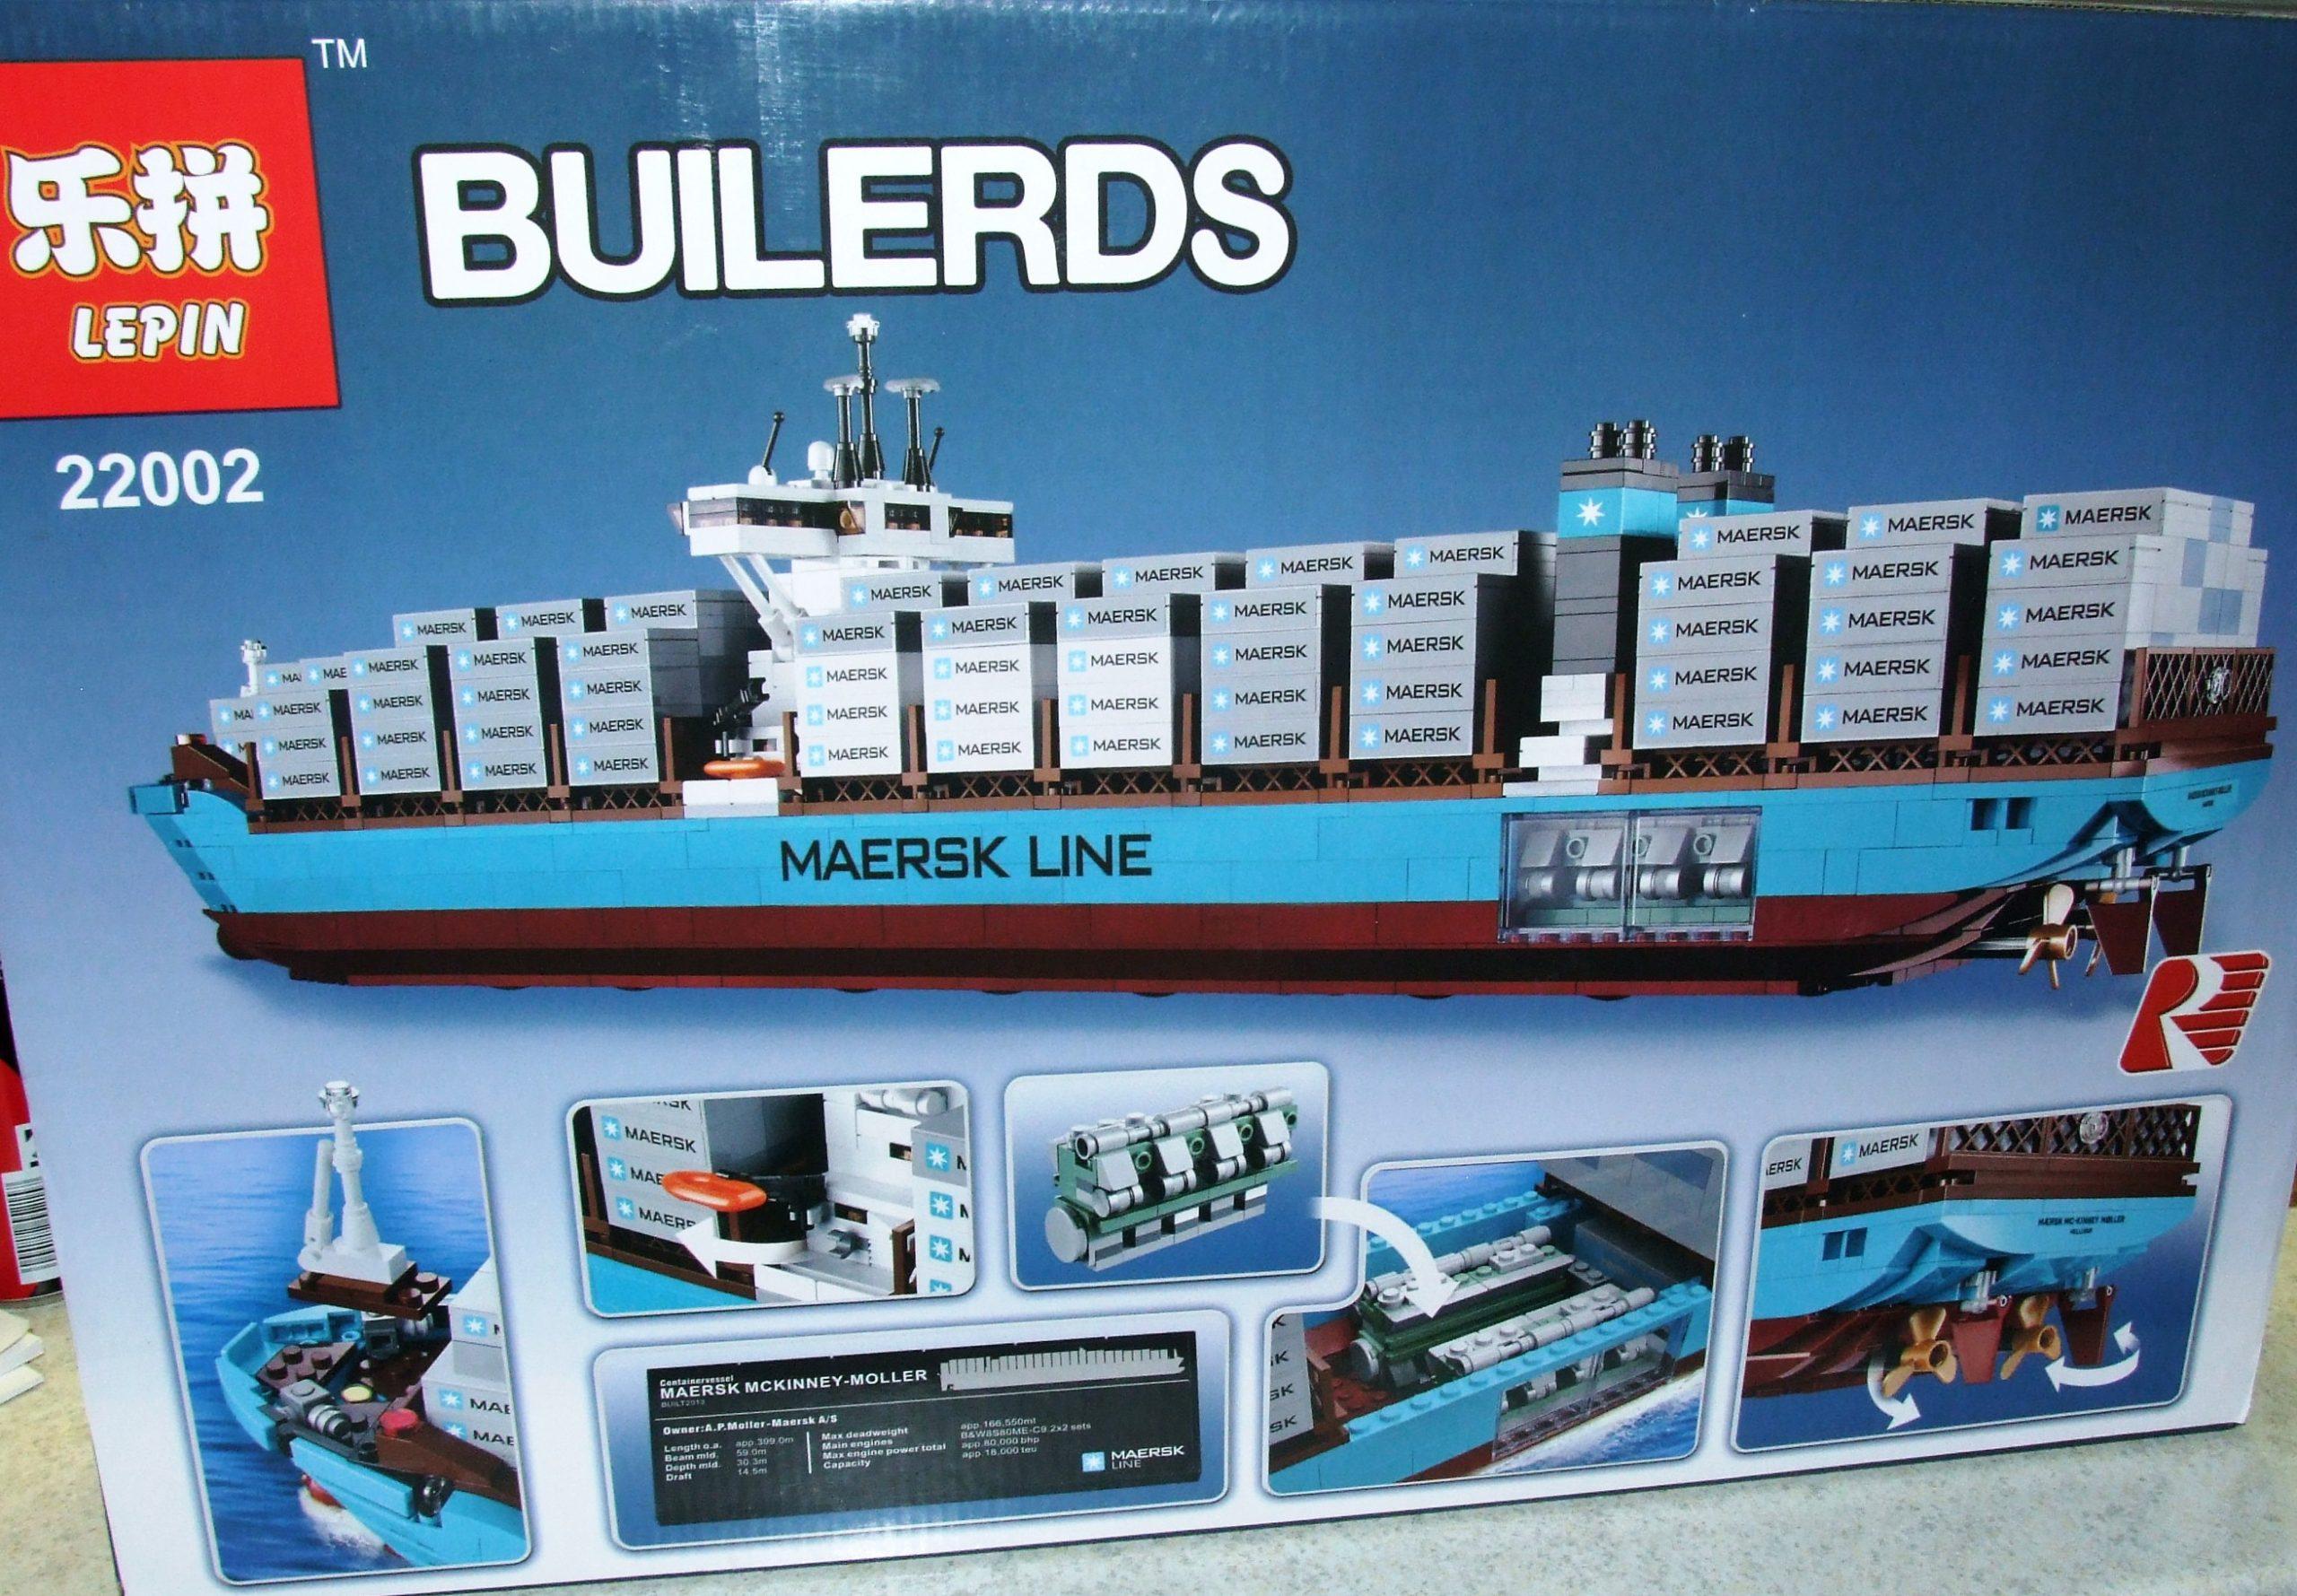 Lepin 22002 Bausatz Großes Containerschiff Maersk bei Playmobil Containerschiff